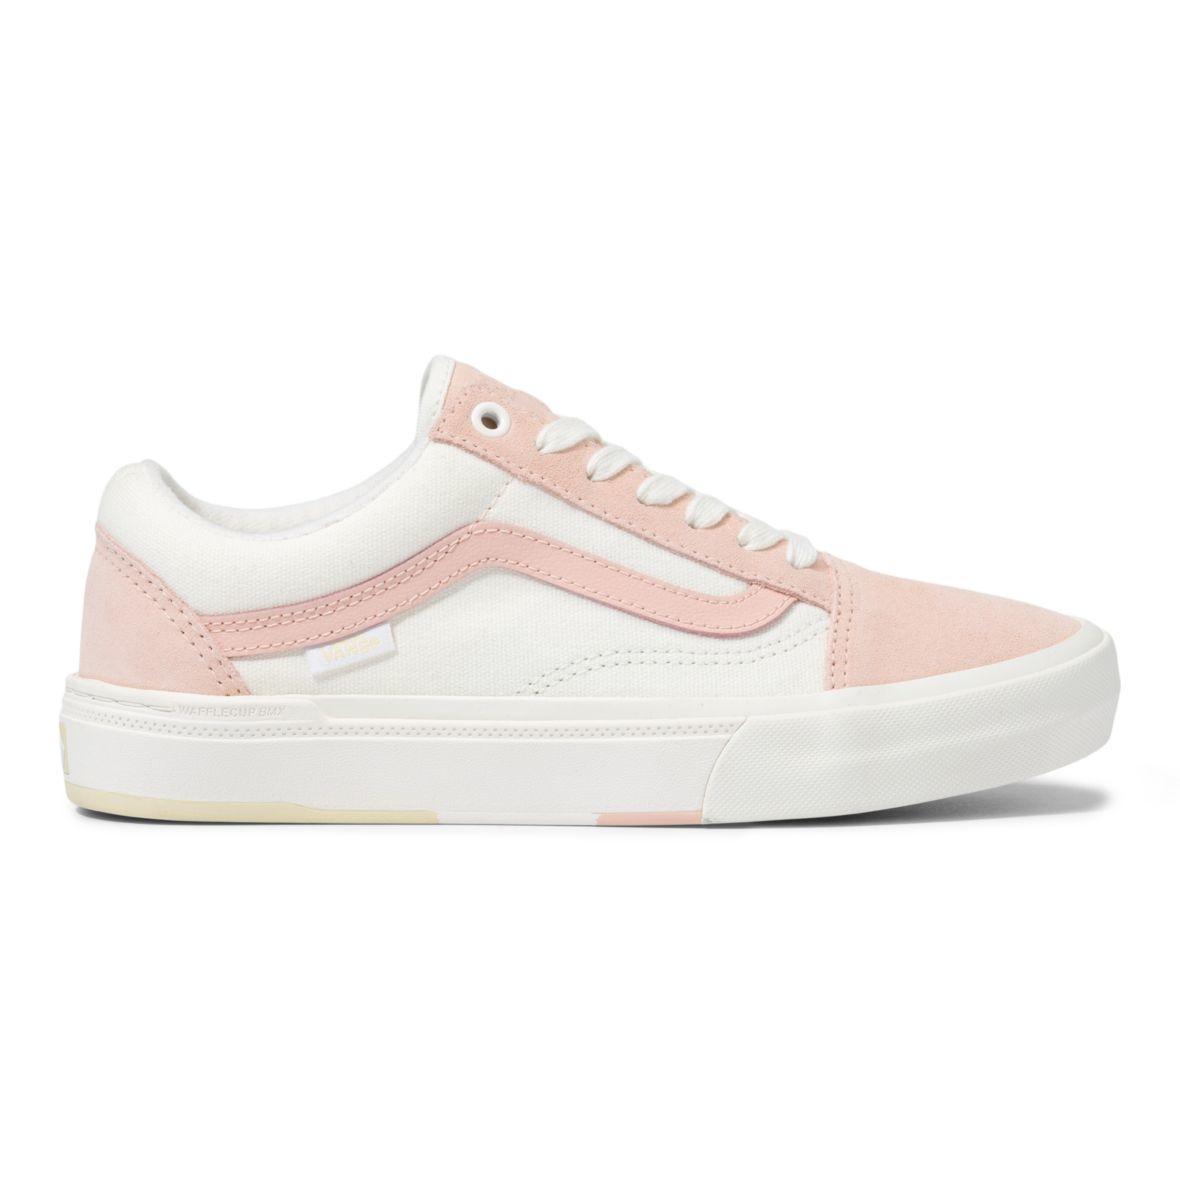 Vans Old Skool Pro BMX Shoe - (Angie Marino) Peach/Marshmallow